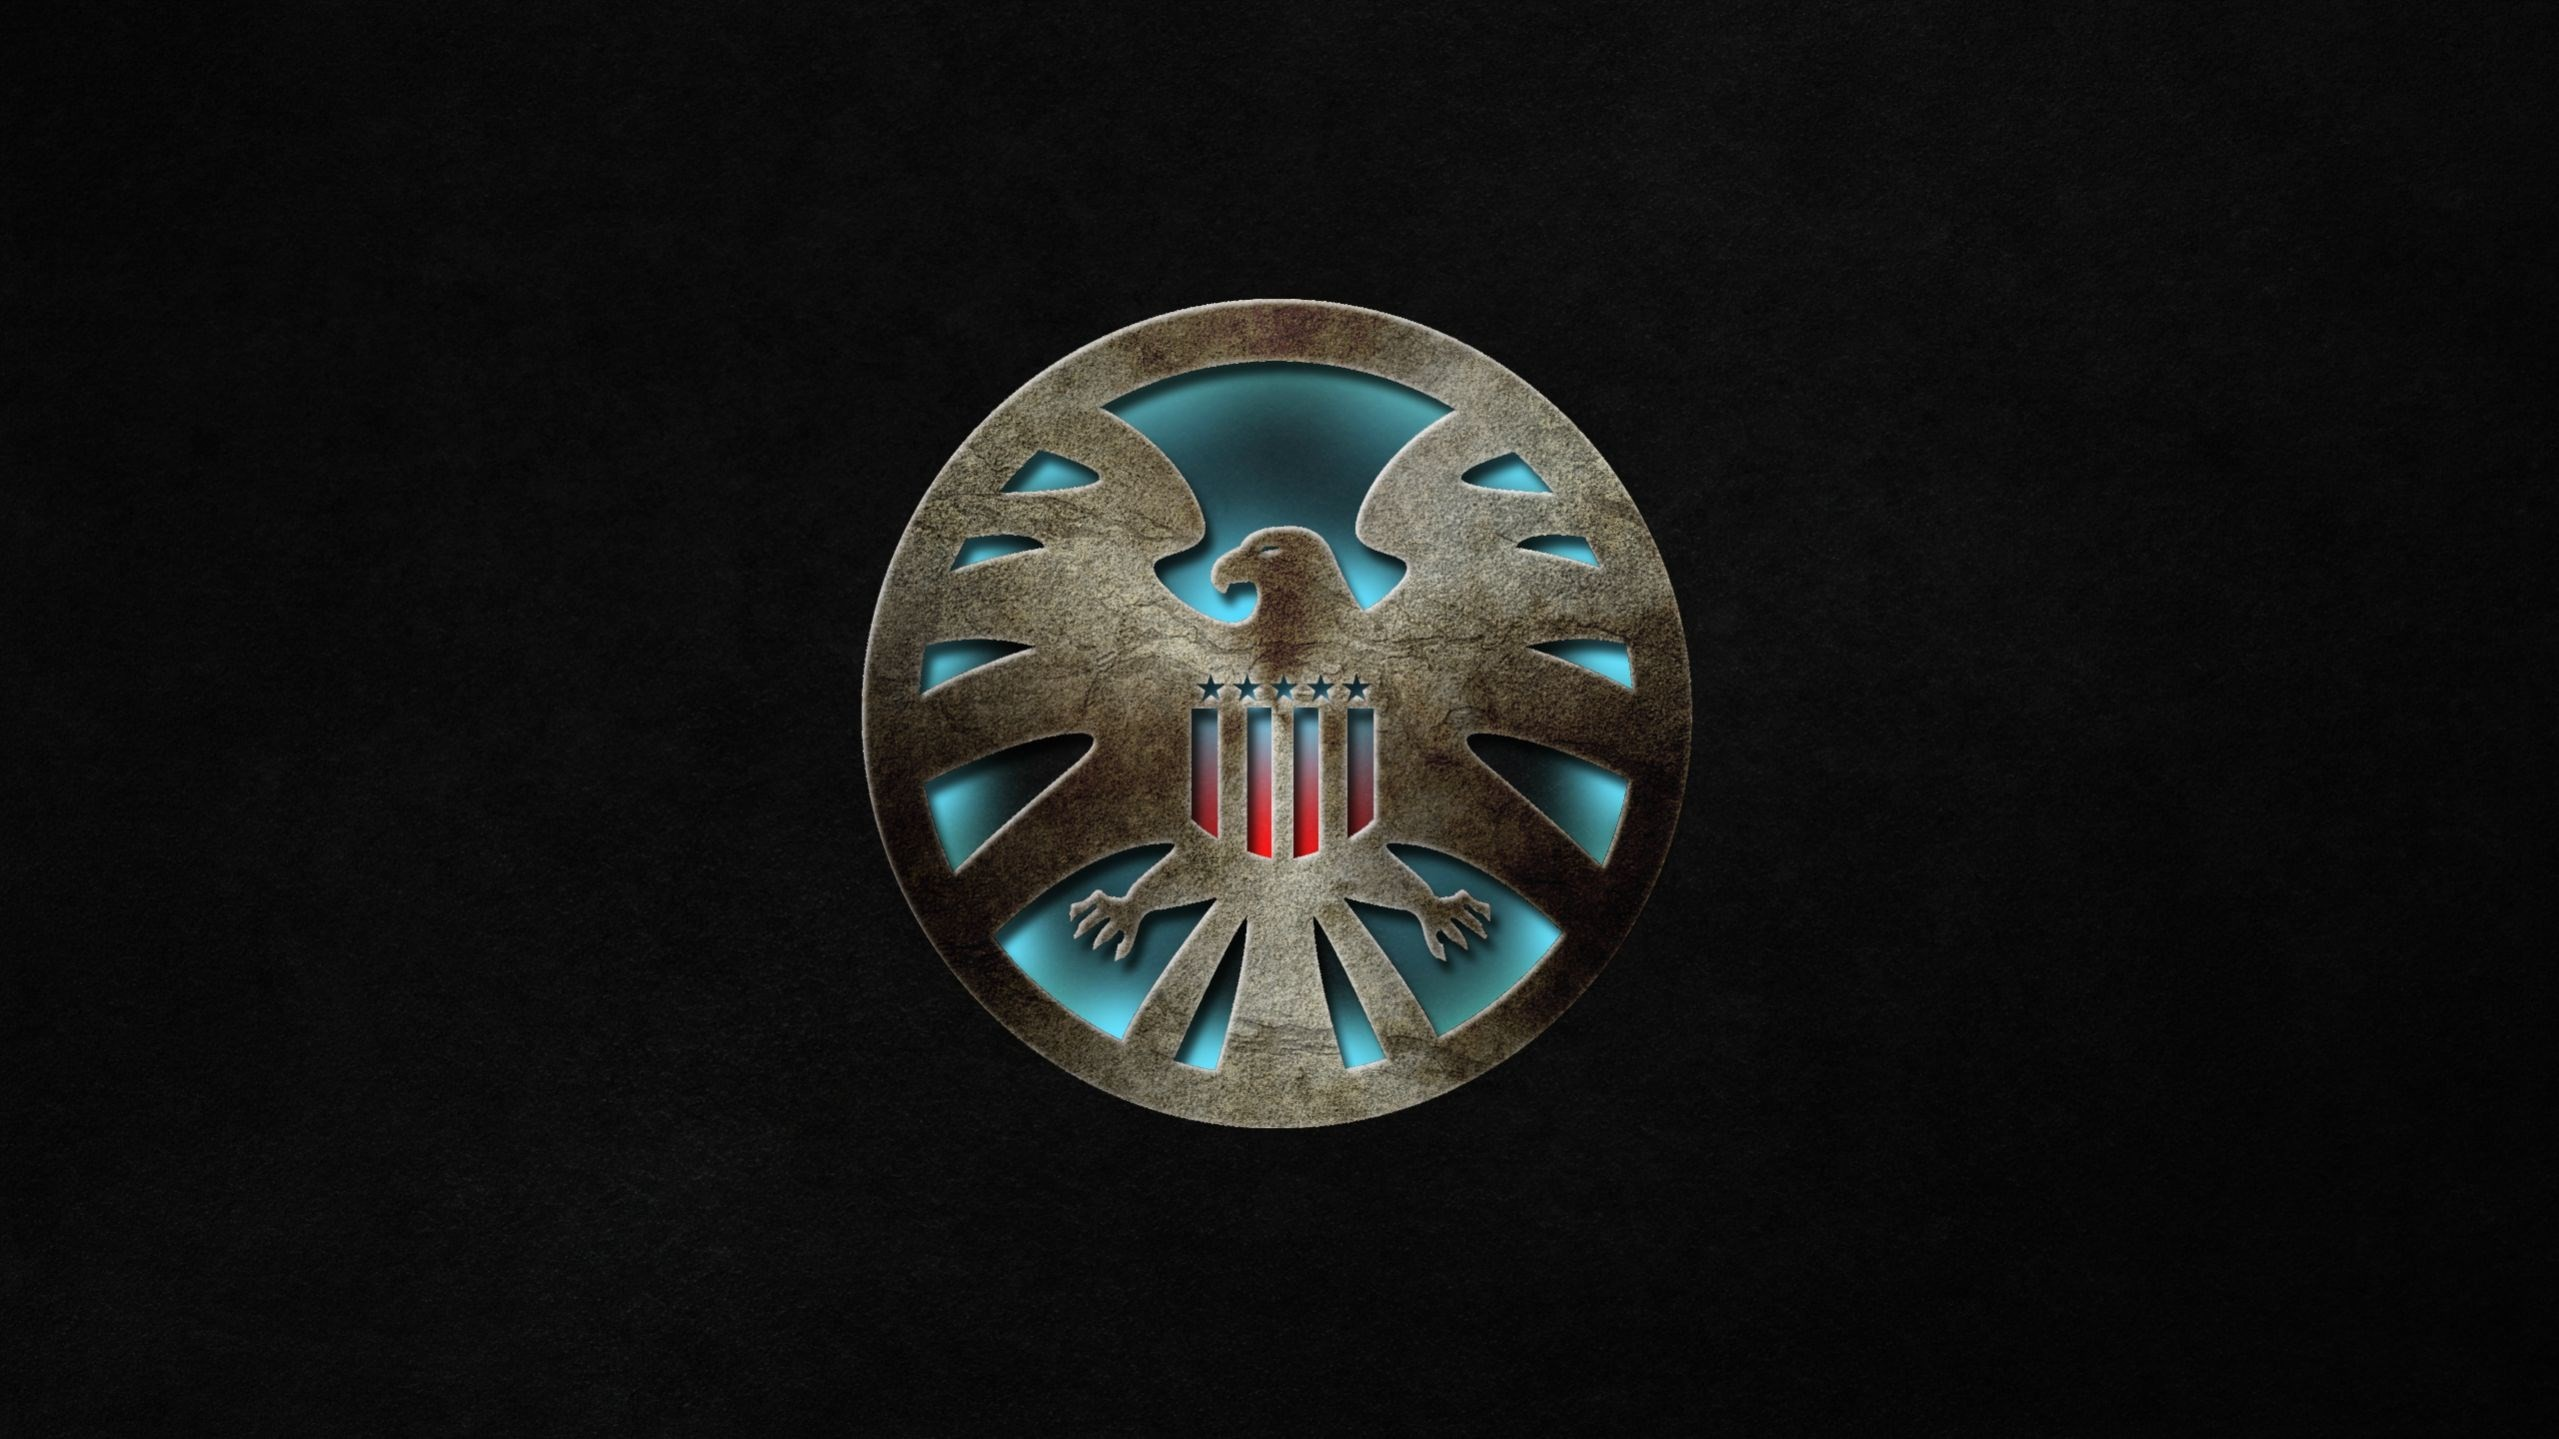 marvel shield logo iphone wallpaper …